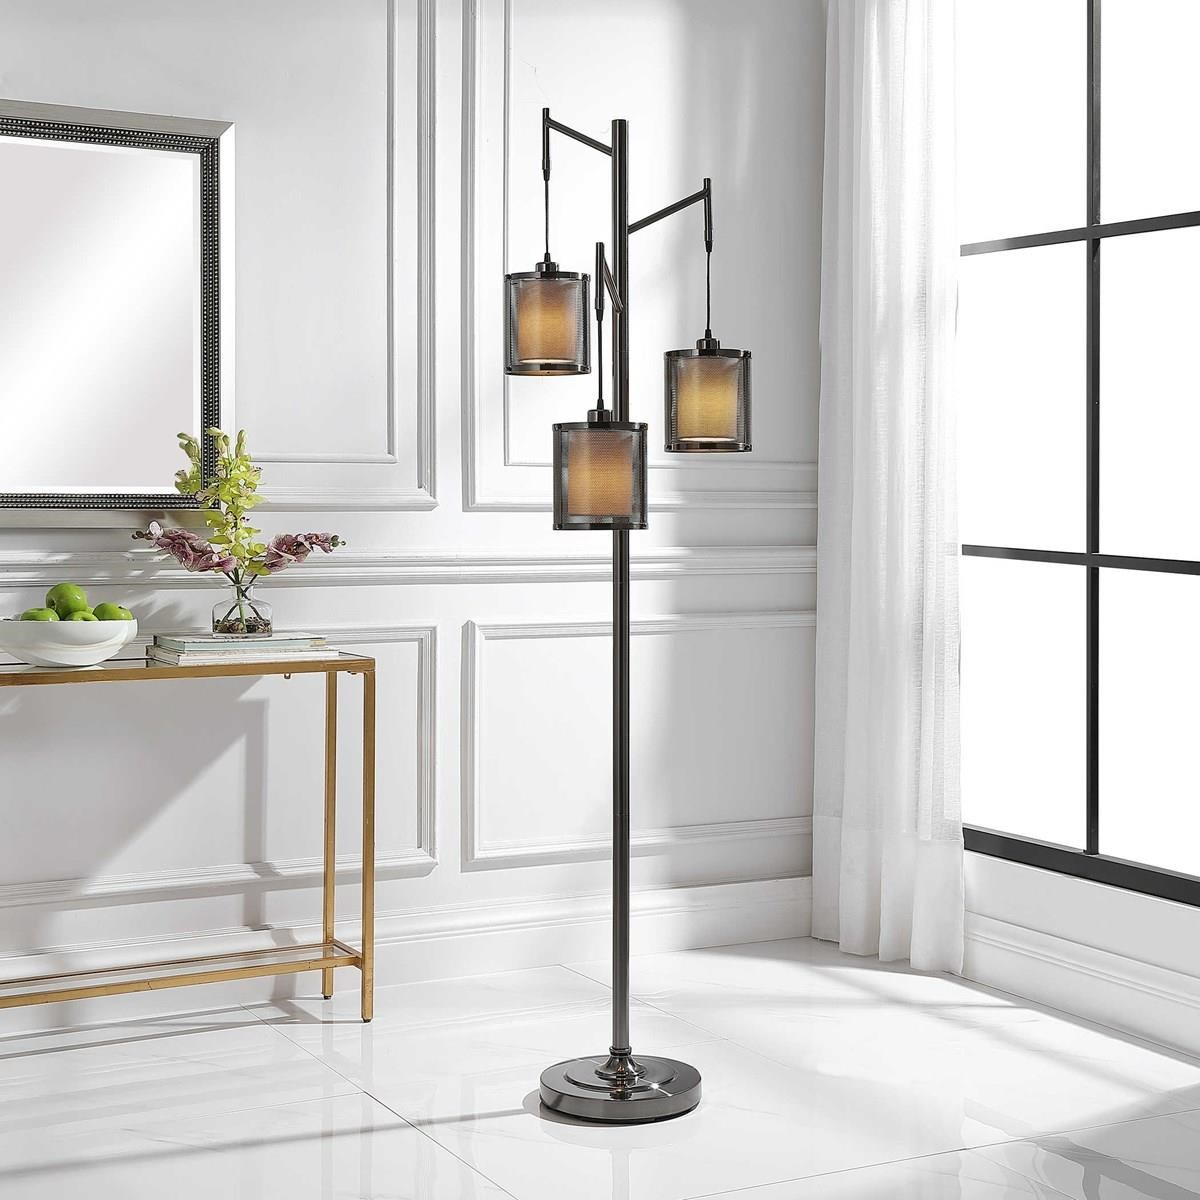 Floor Lamps SYDNEY FLOOR LAMP by Unique at Walker's Furniture